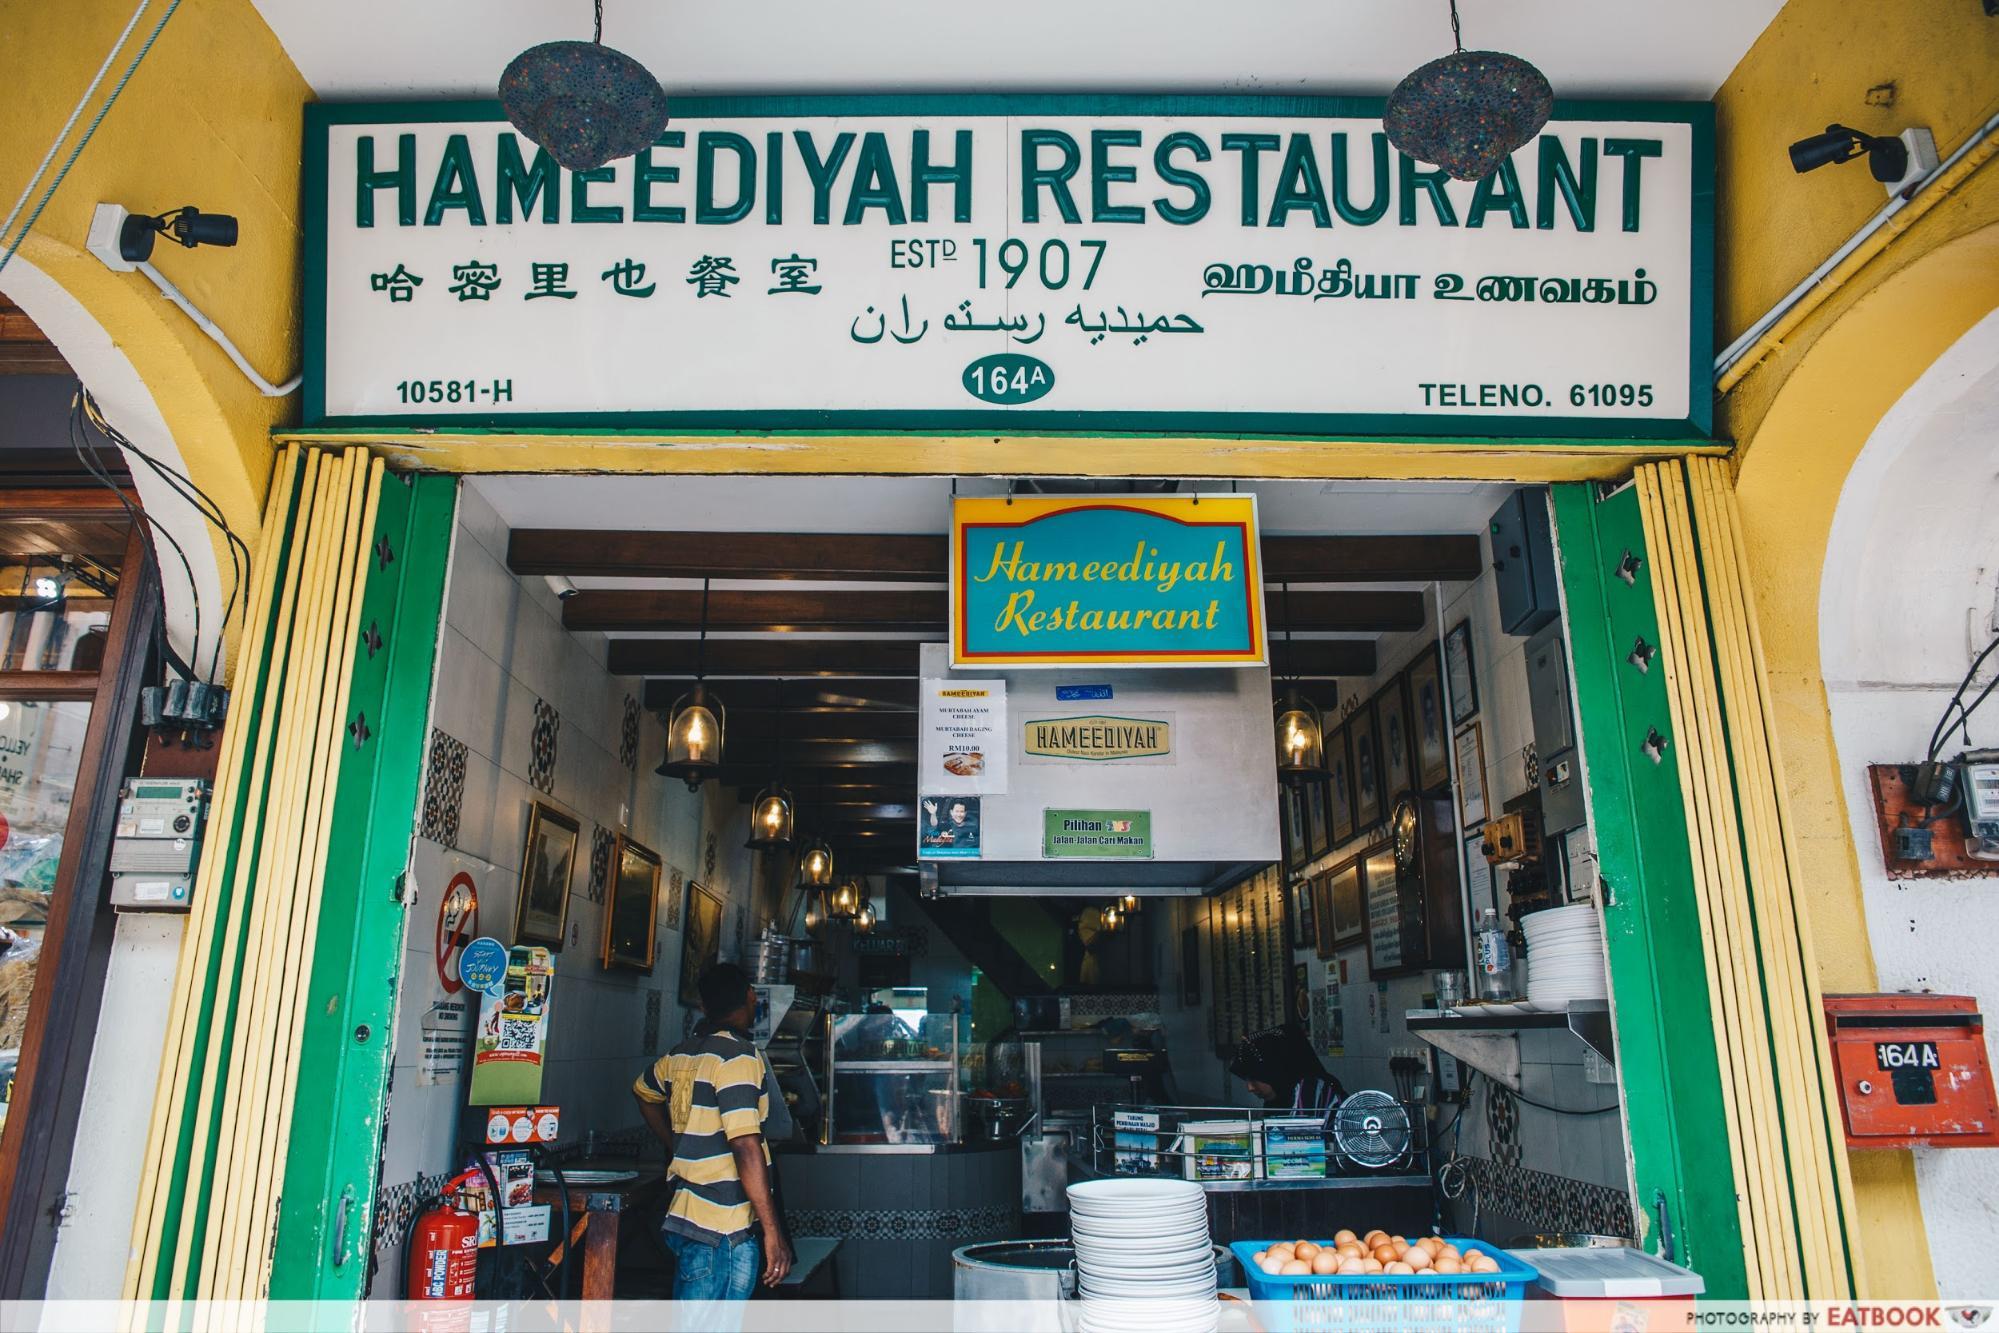 Penang Hawker Food - Hameediyah Restaurant